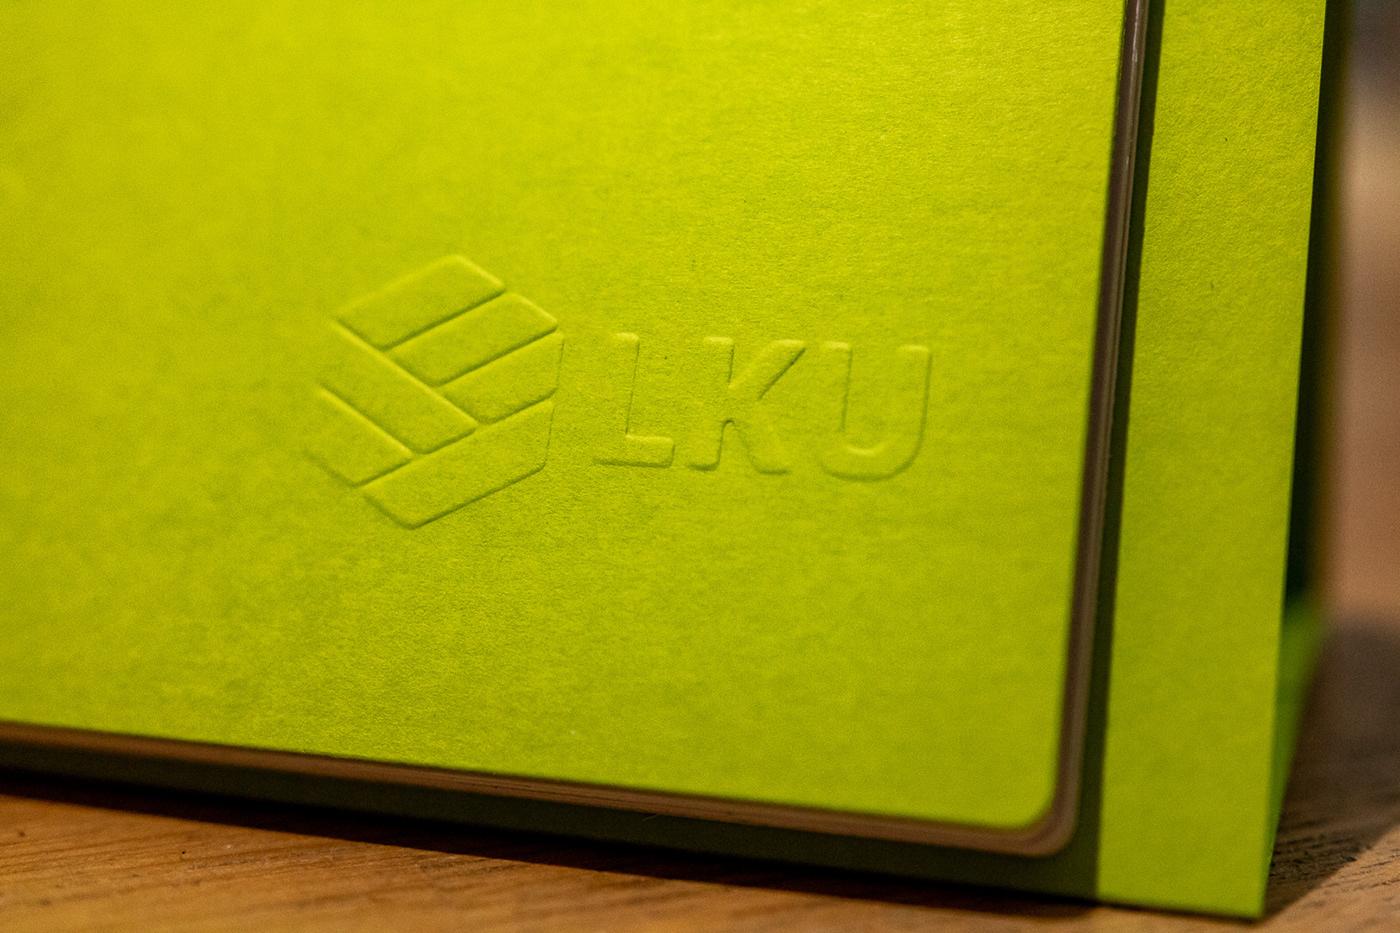 lku,calendar,credit,green,alius,cechas,kalendorius,design